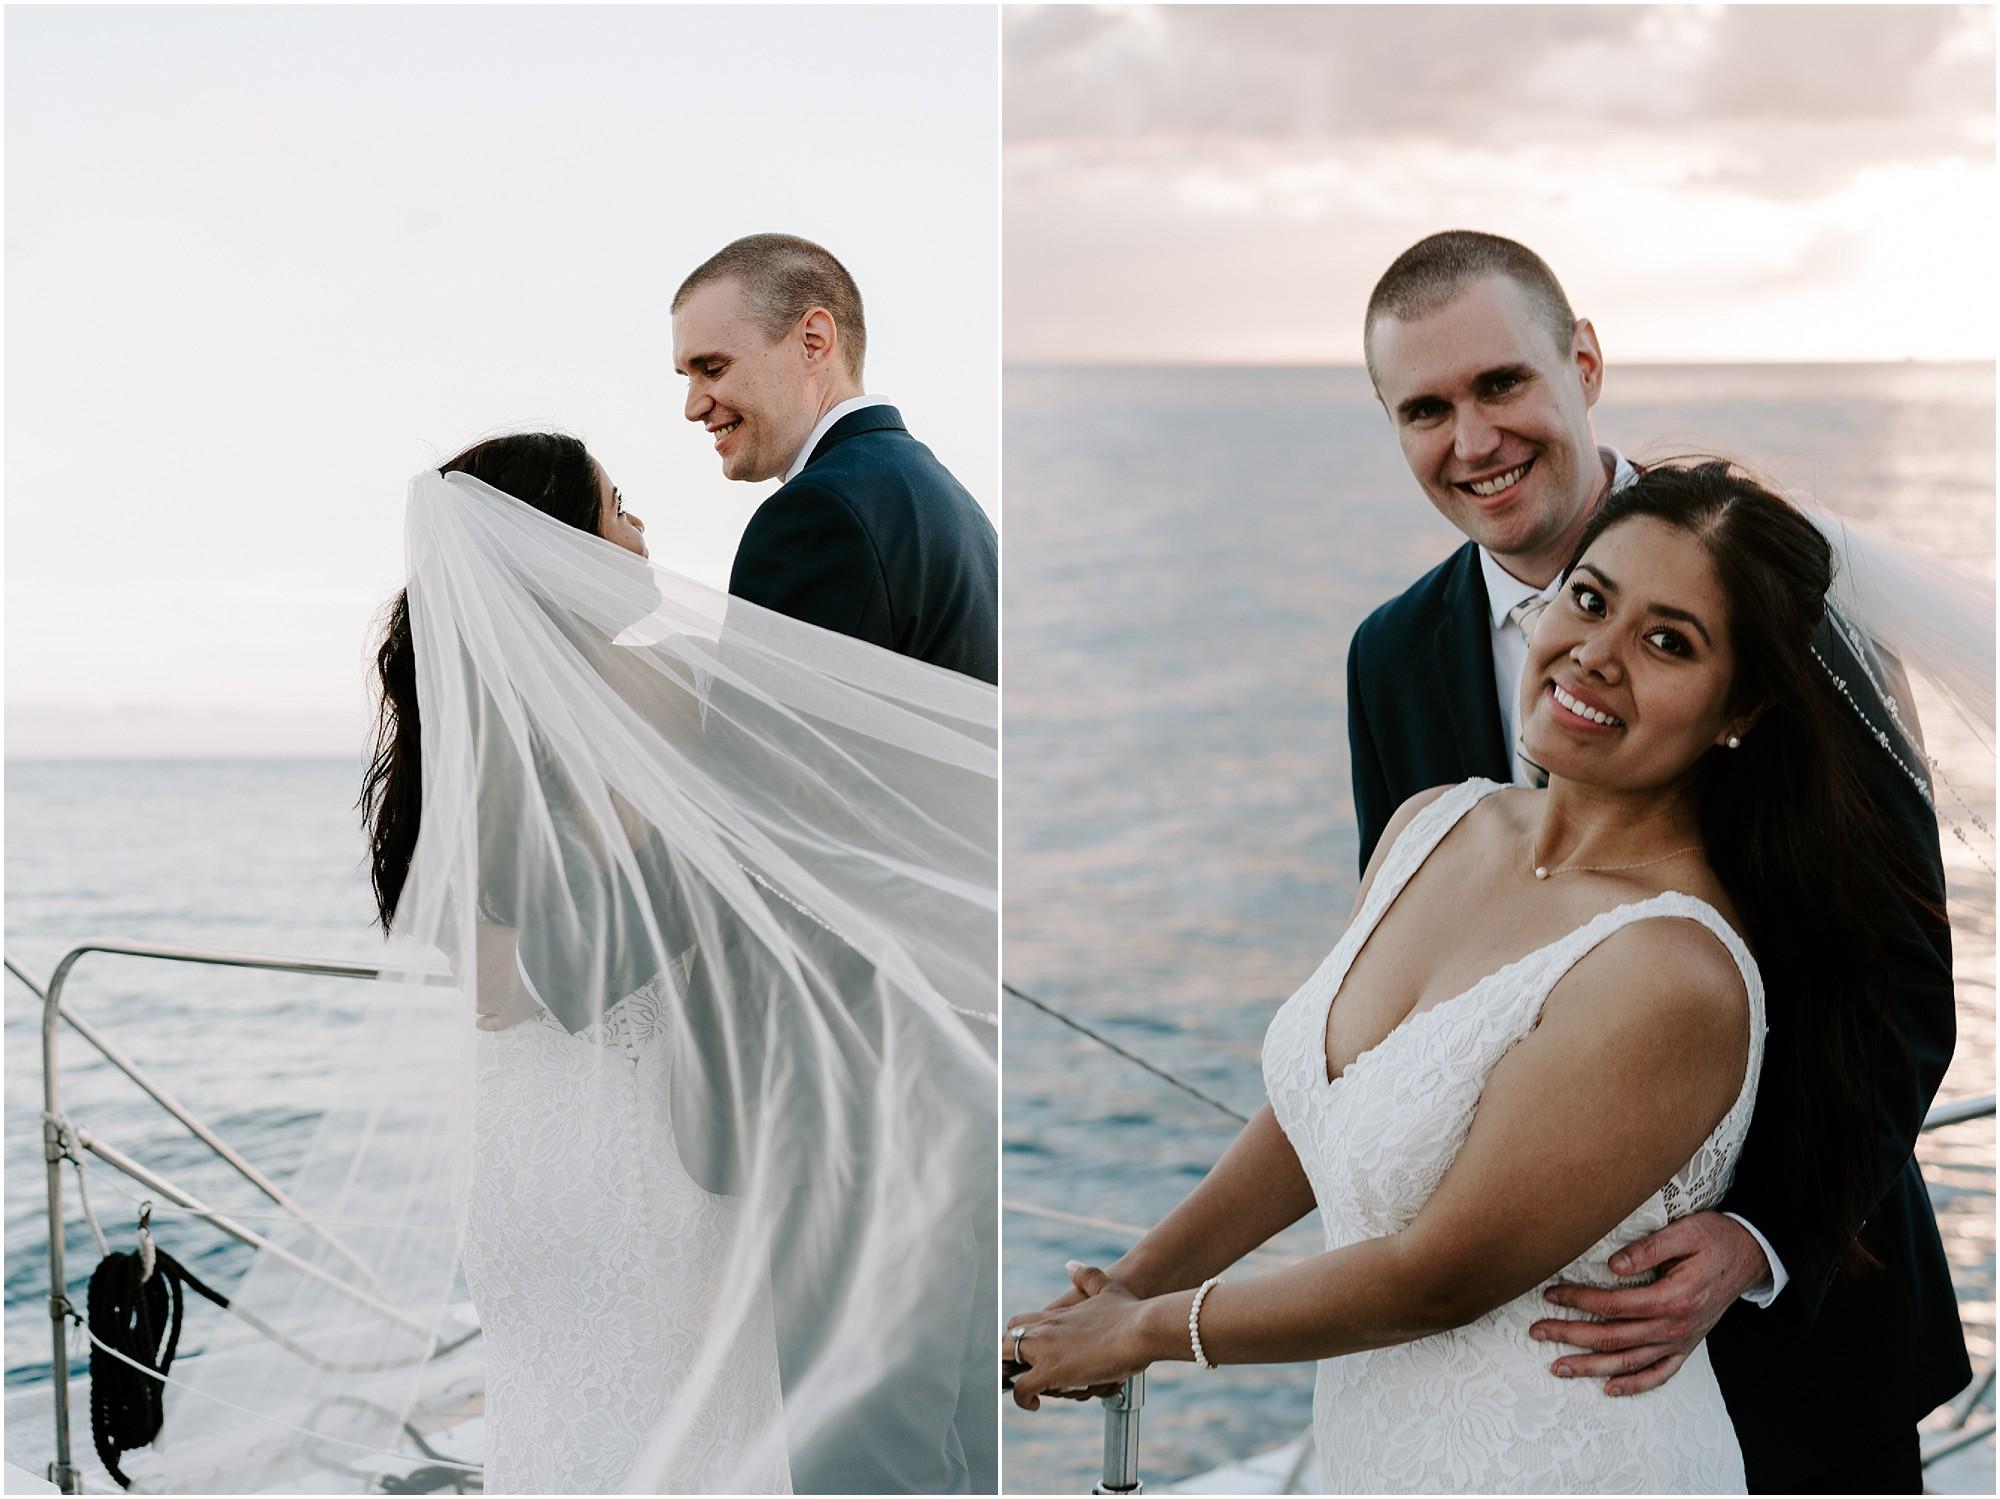 oahu-intimate-wedding-catamaran-honolulu_0016.jpg